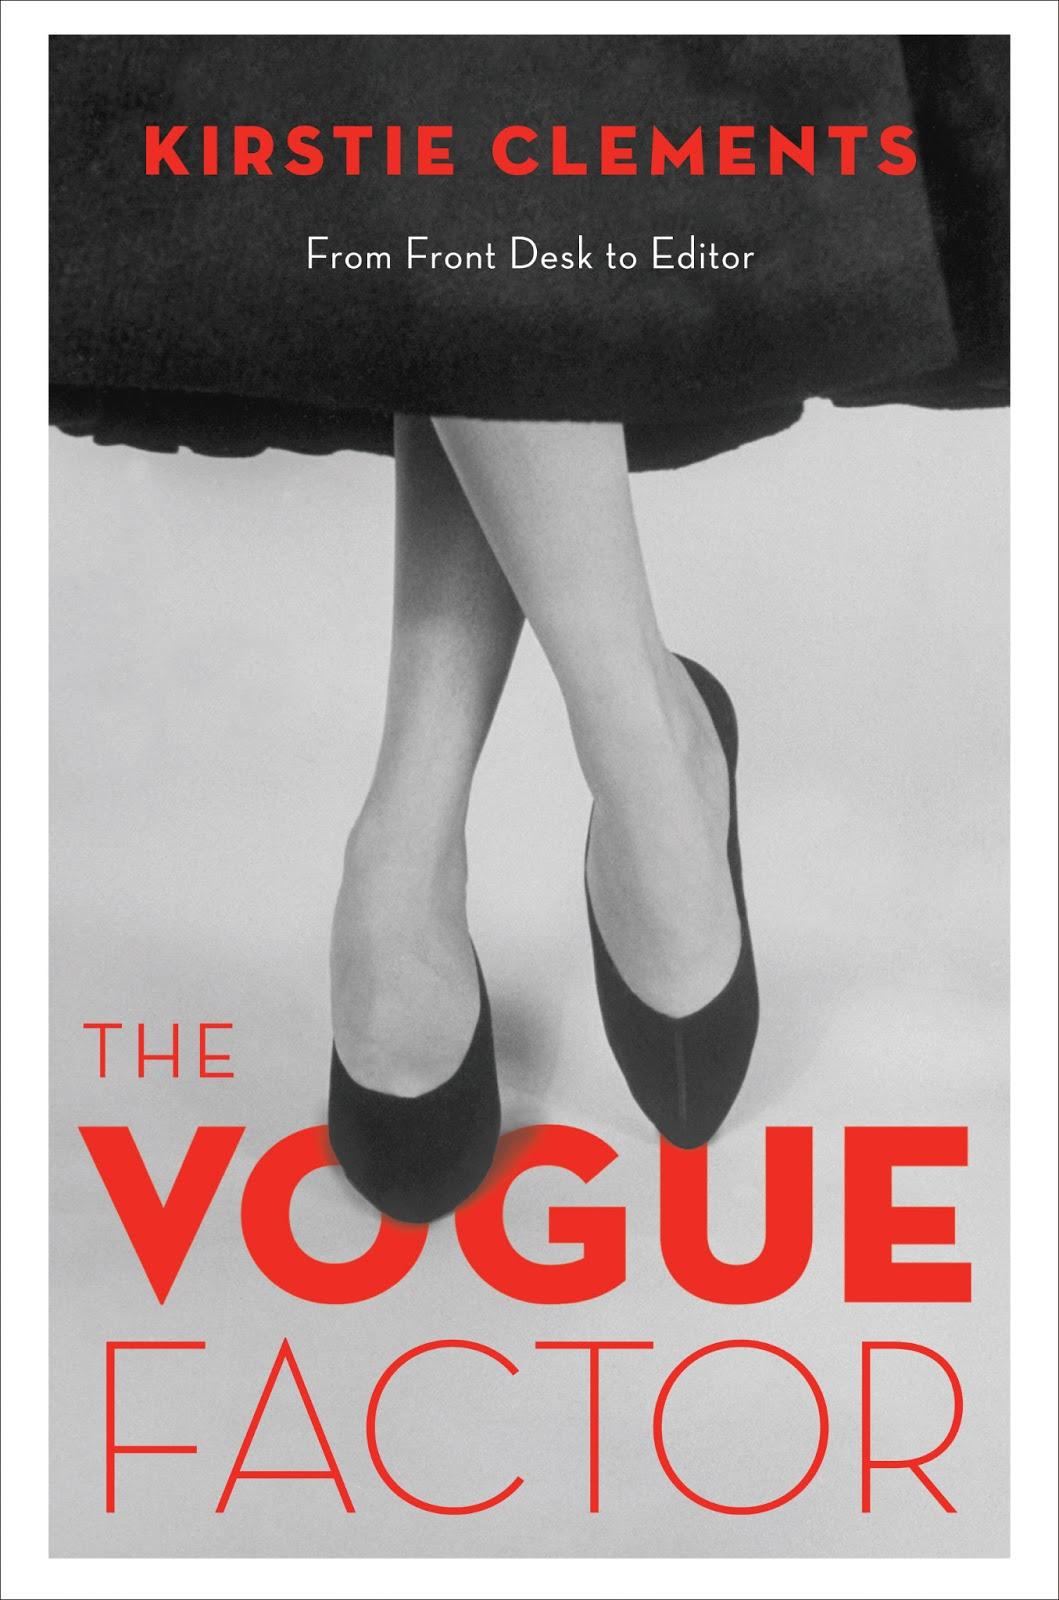 Vogue-Factor